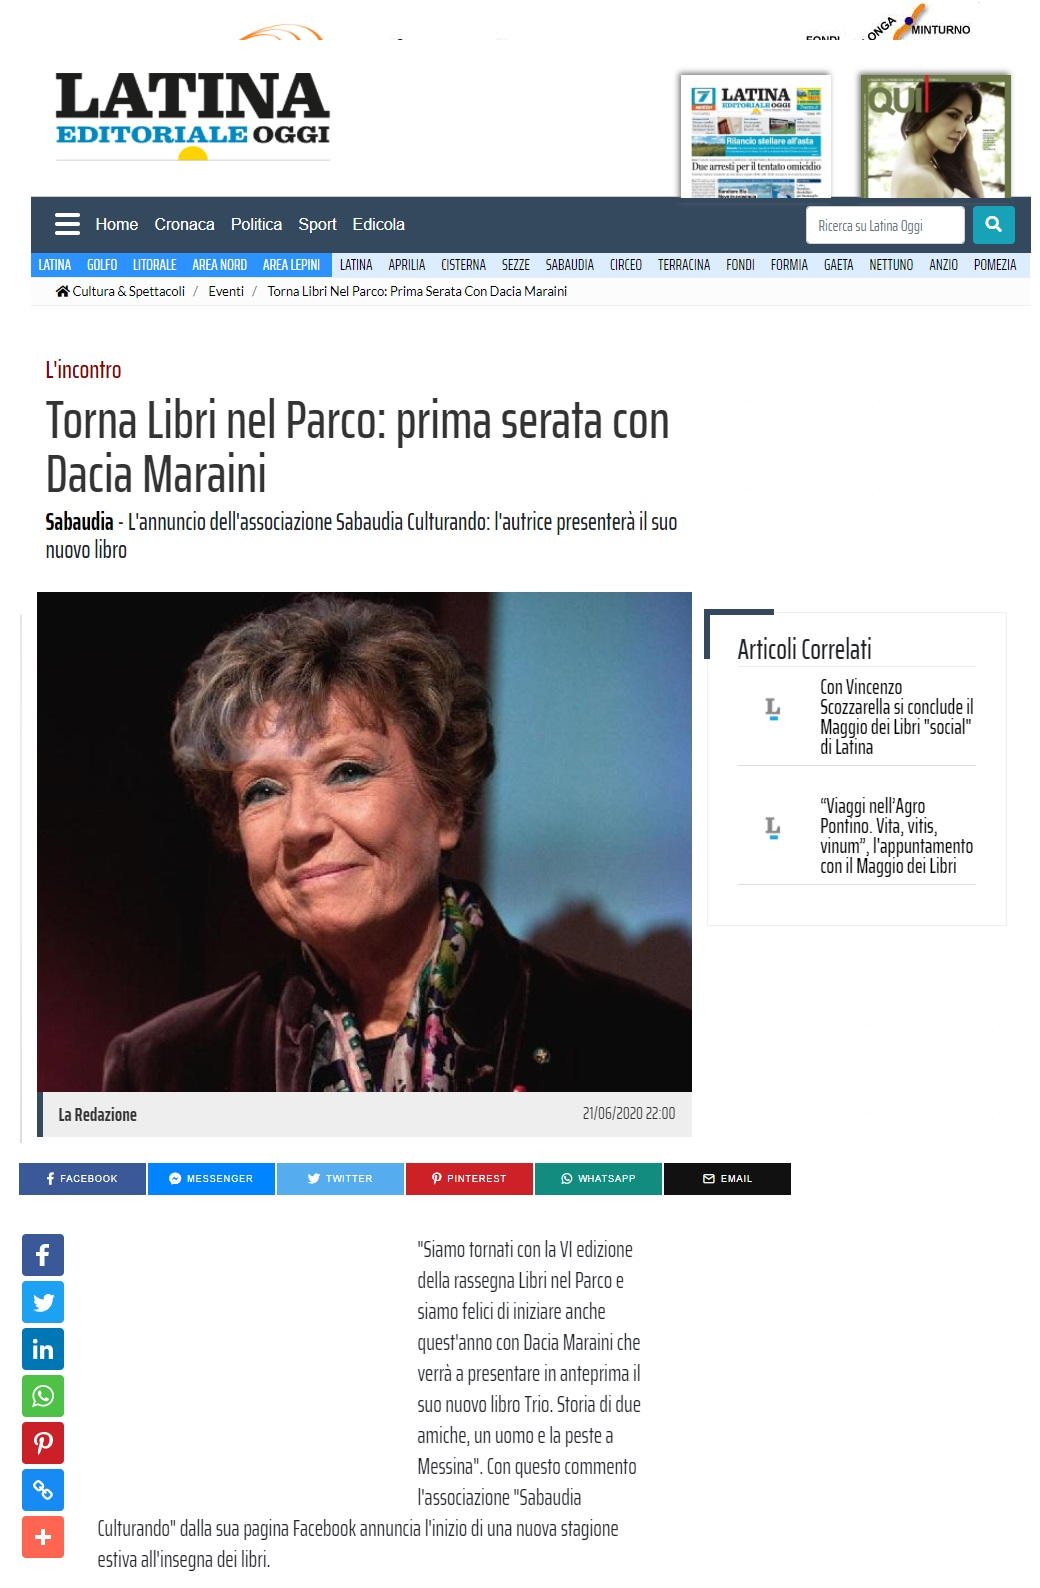 Latina Editoriale Oggi 21 Giugno 2020